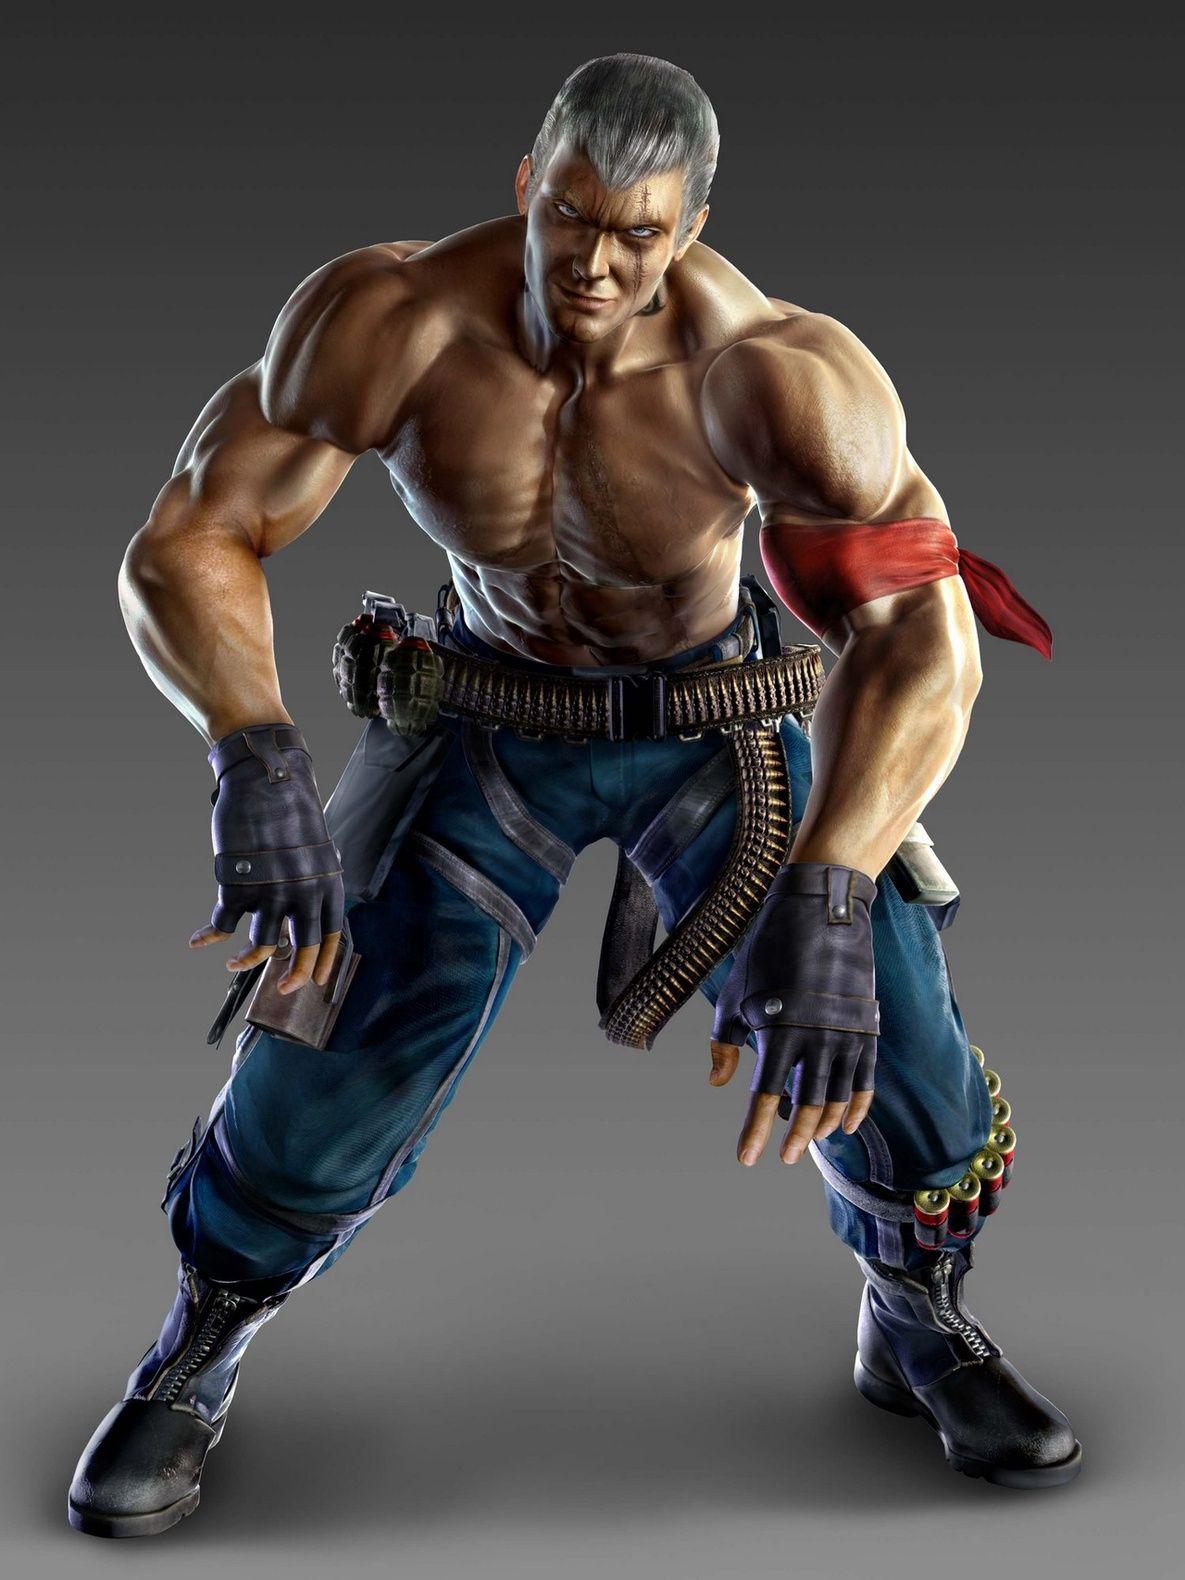 Tekken 6 Bryan Fury Video Game Art Mobile Wallpaper